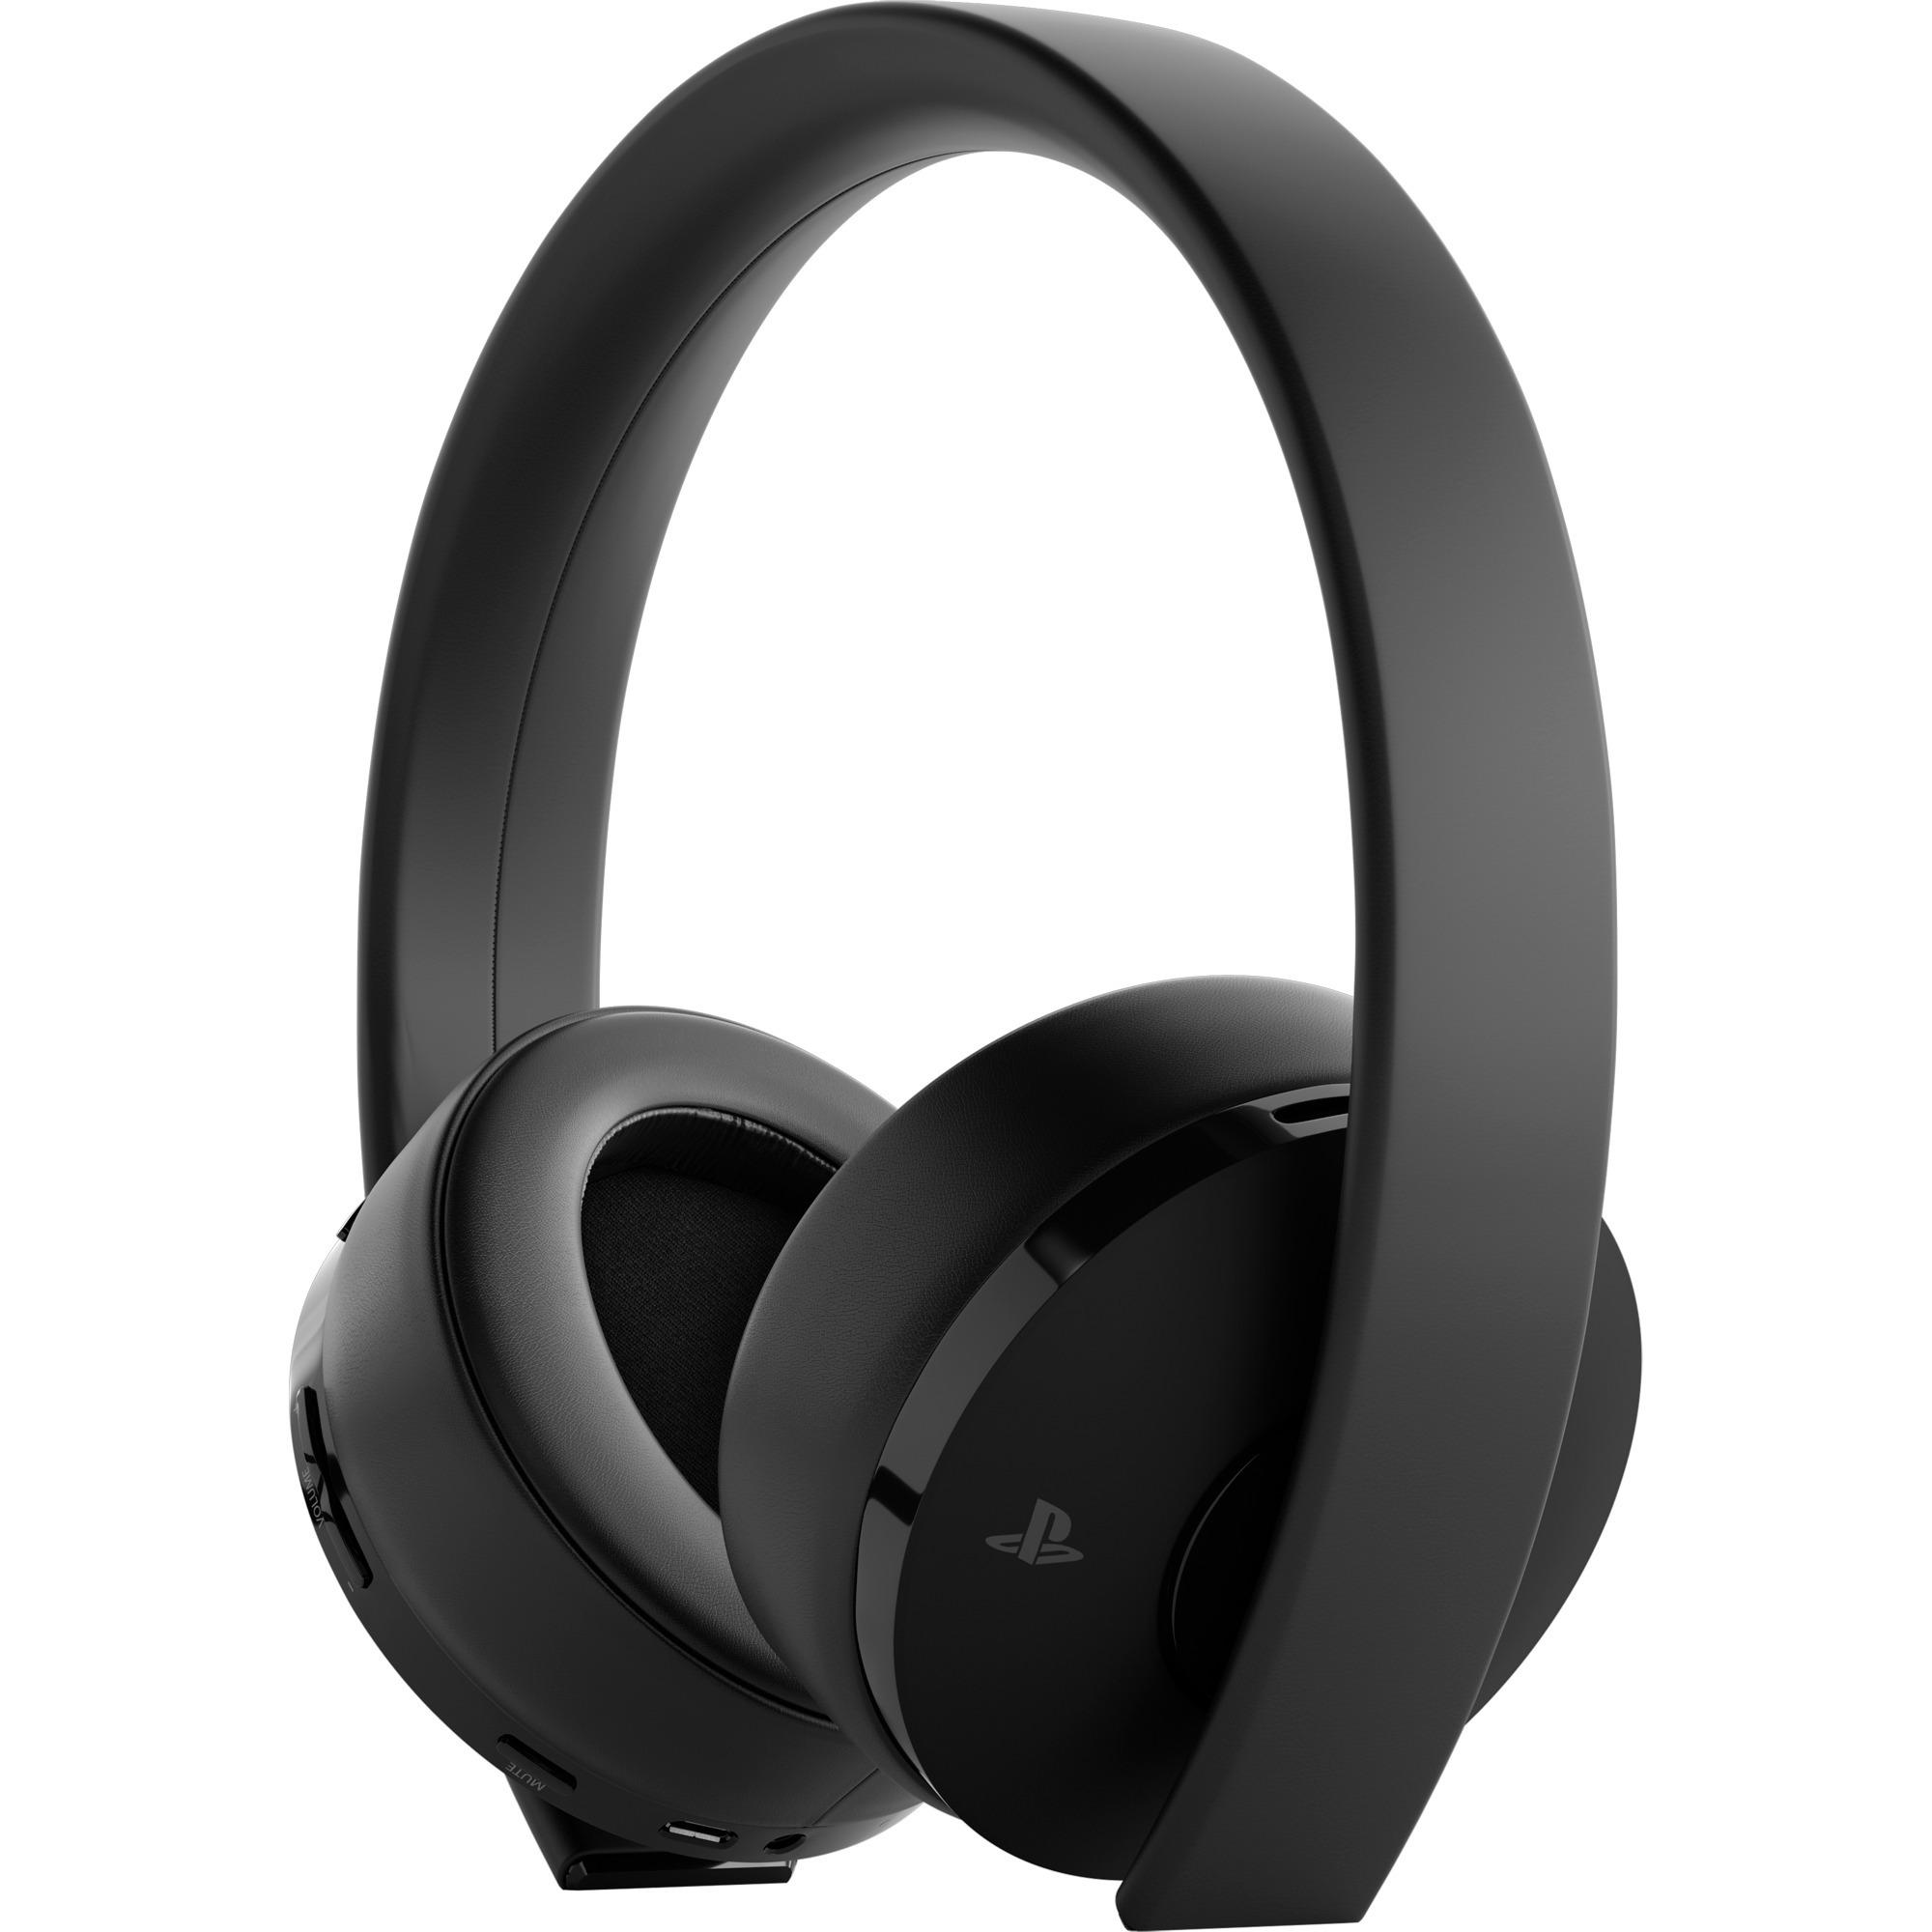 9455165 Binaural Diadema Negro auricular con micrófono, Auriculares con micrófono